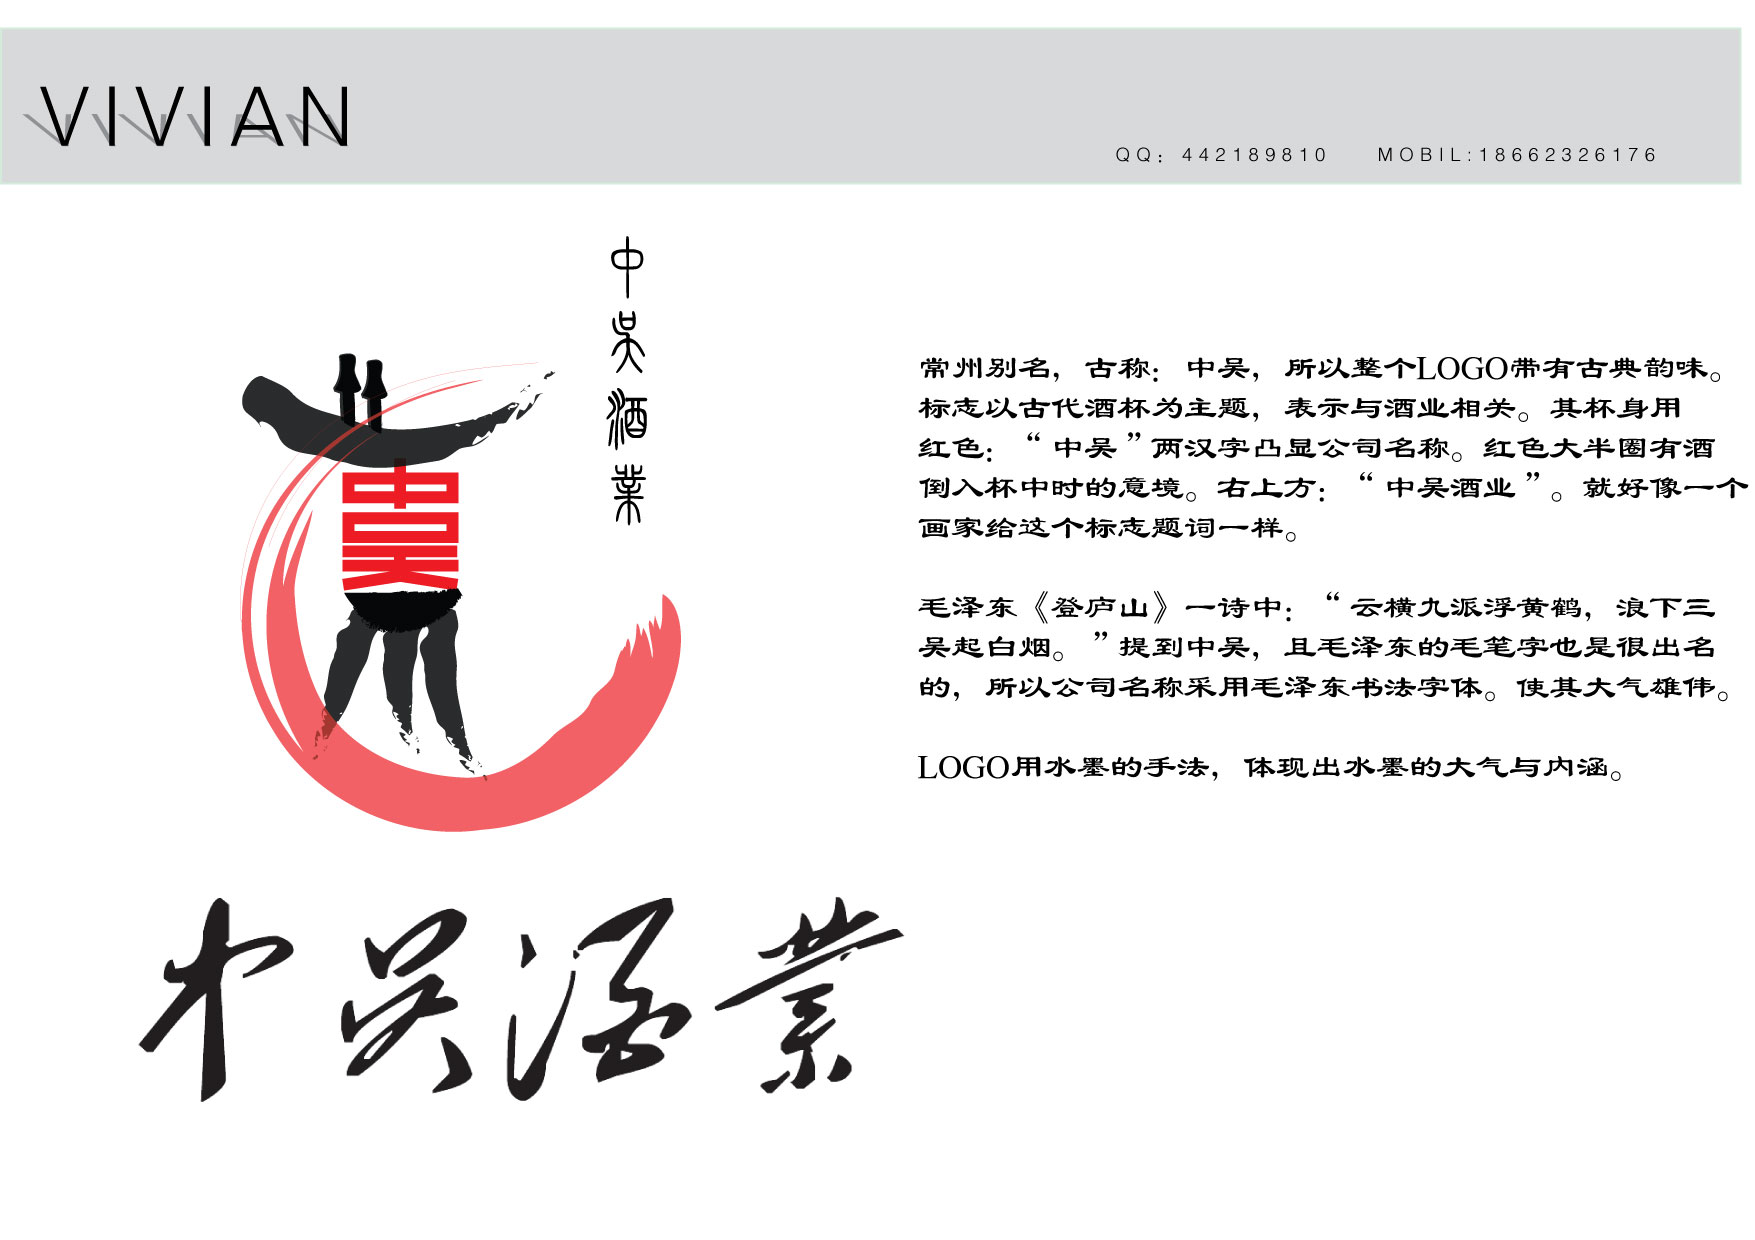 中吴酒业logo设计_vivian_hiclin_logo设计_136813